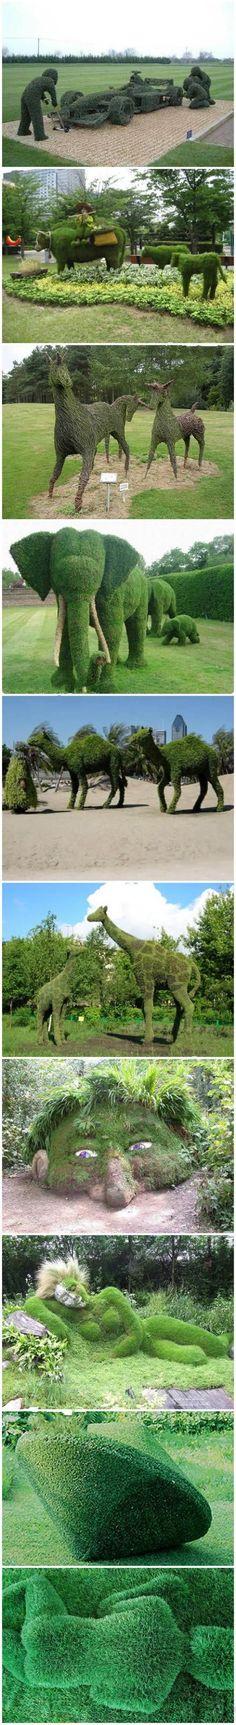 Best place for visit : 10 excellent garden grass sculpture artworks